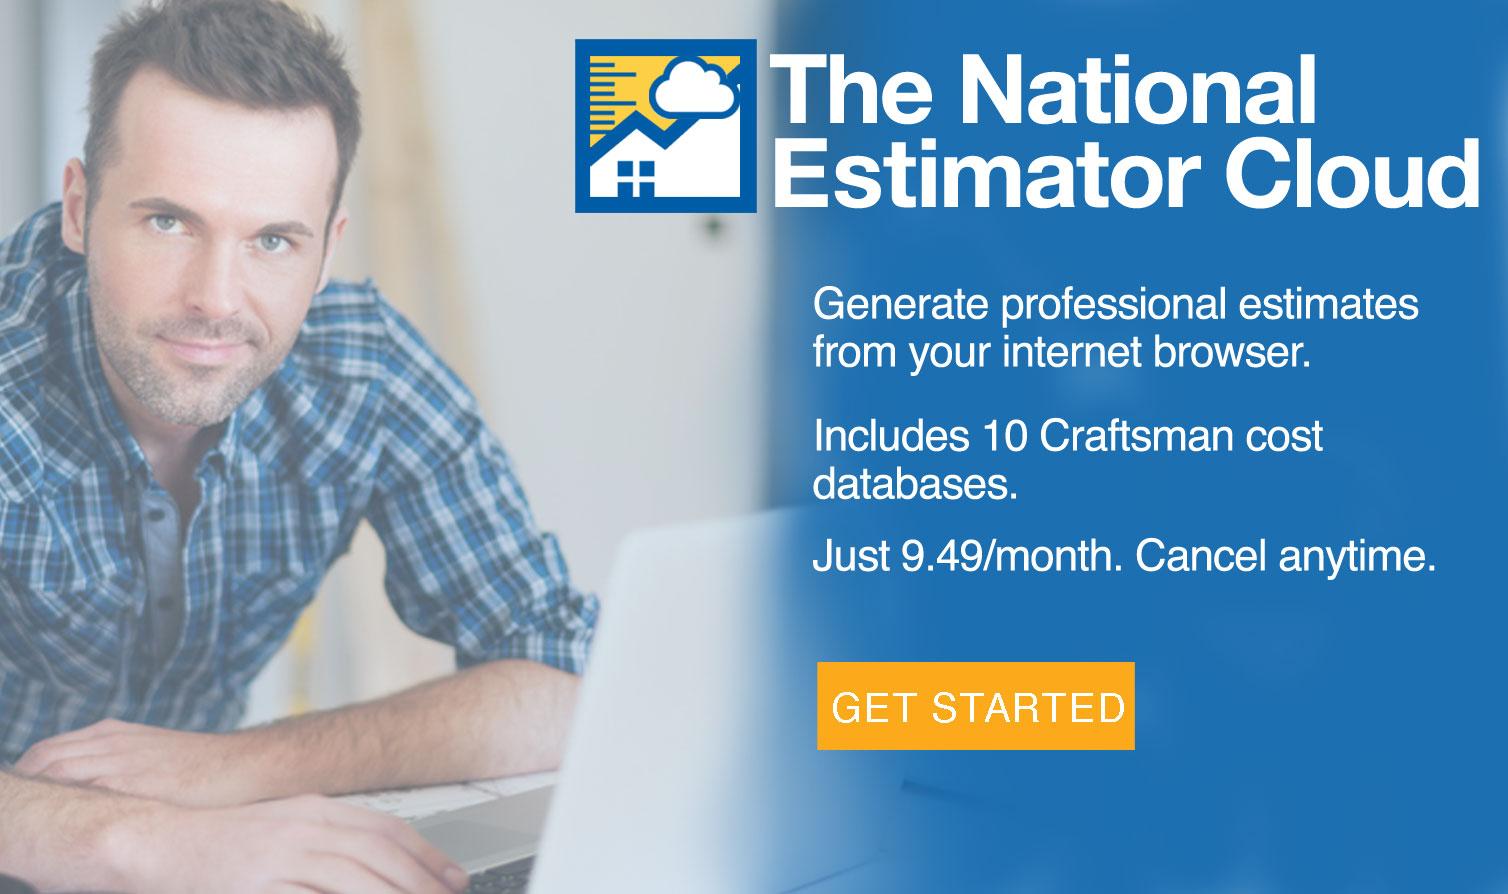 Craftsman National Estimator Cloud